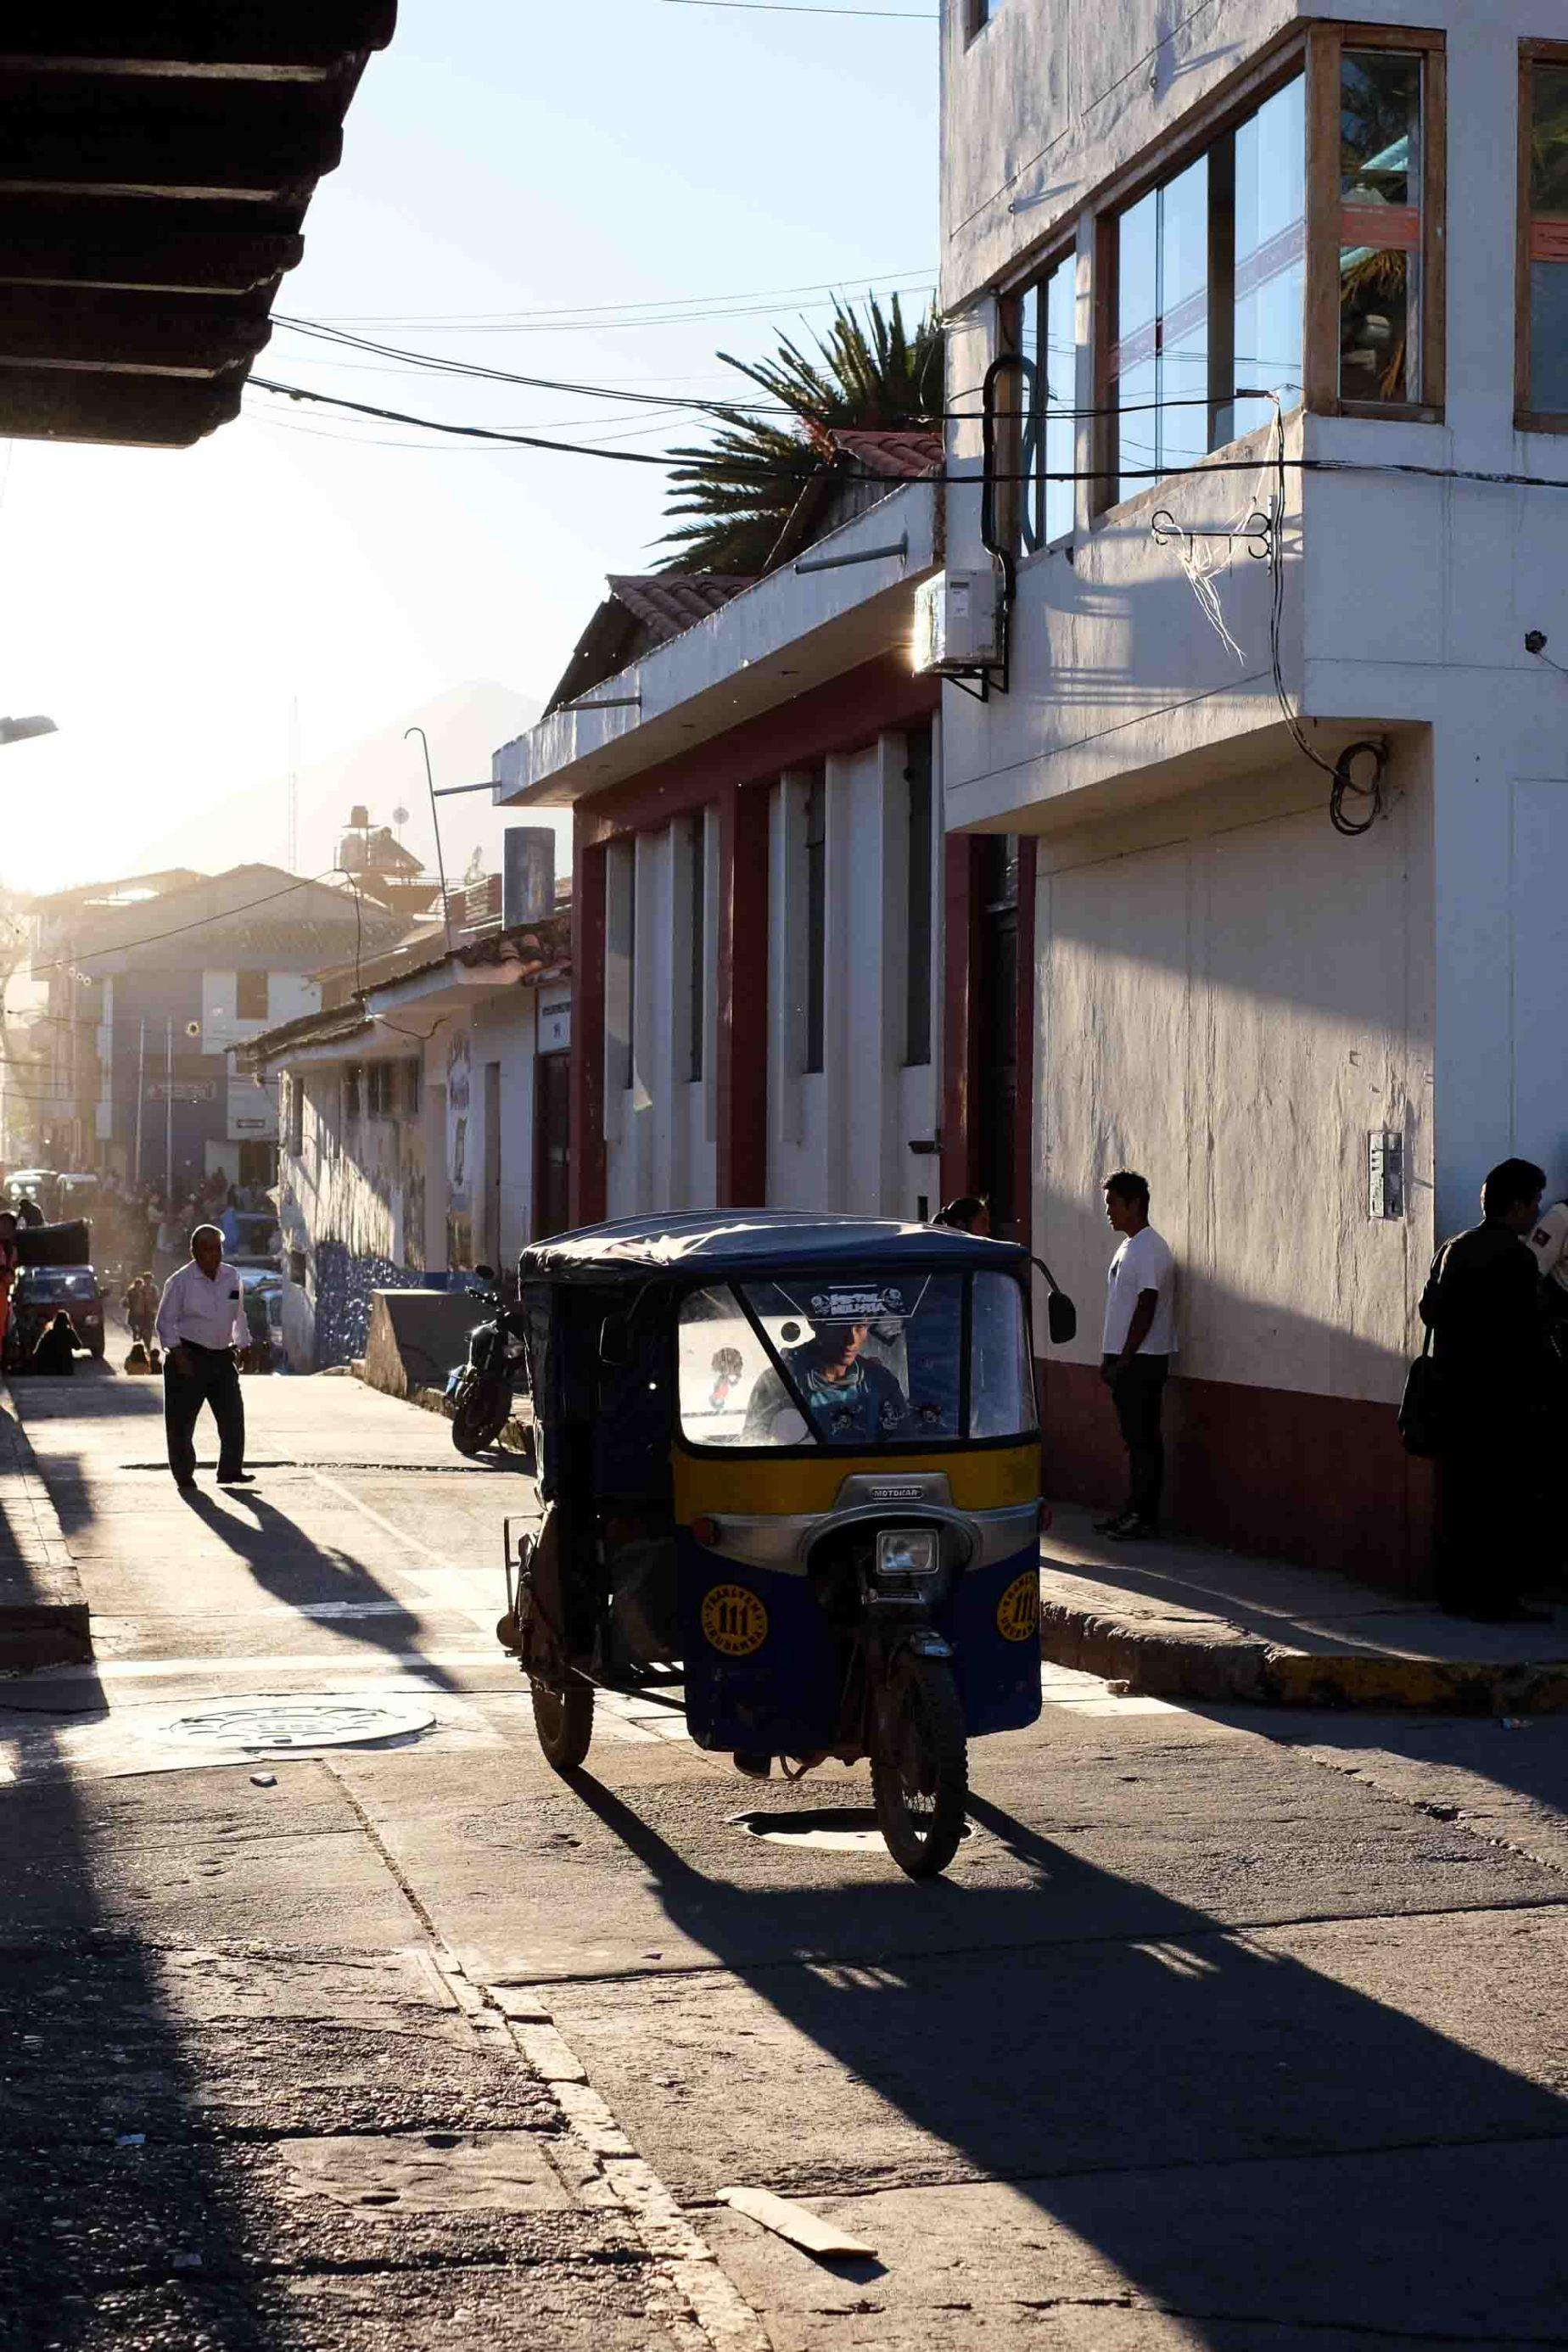 Motocarro/Motocar/Mototaxi (whatever you prefer) in Urubamba, Cusco.